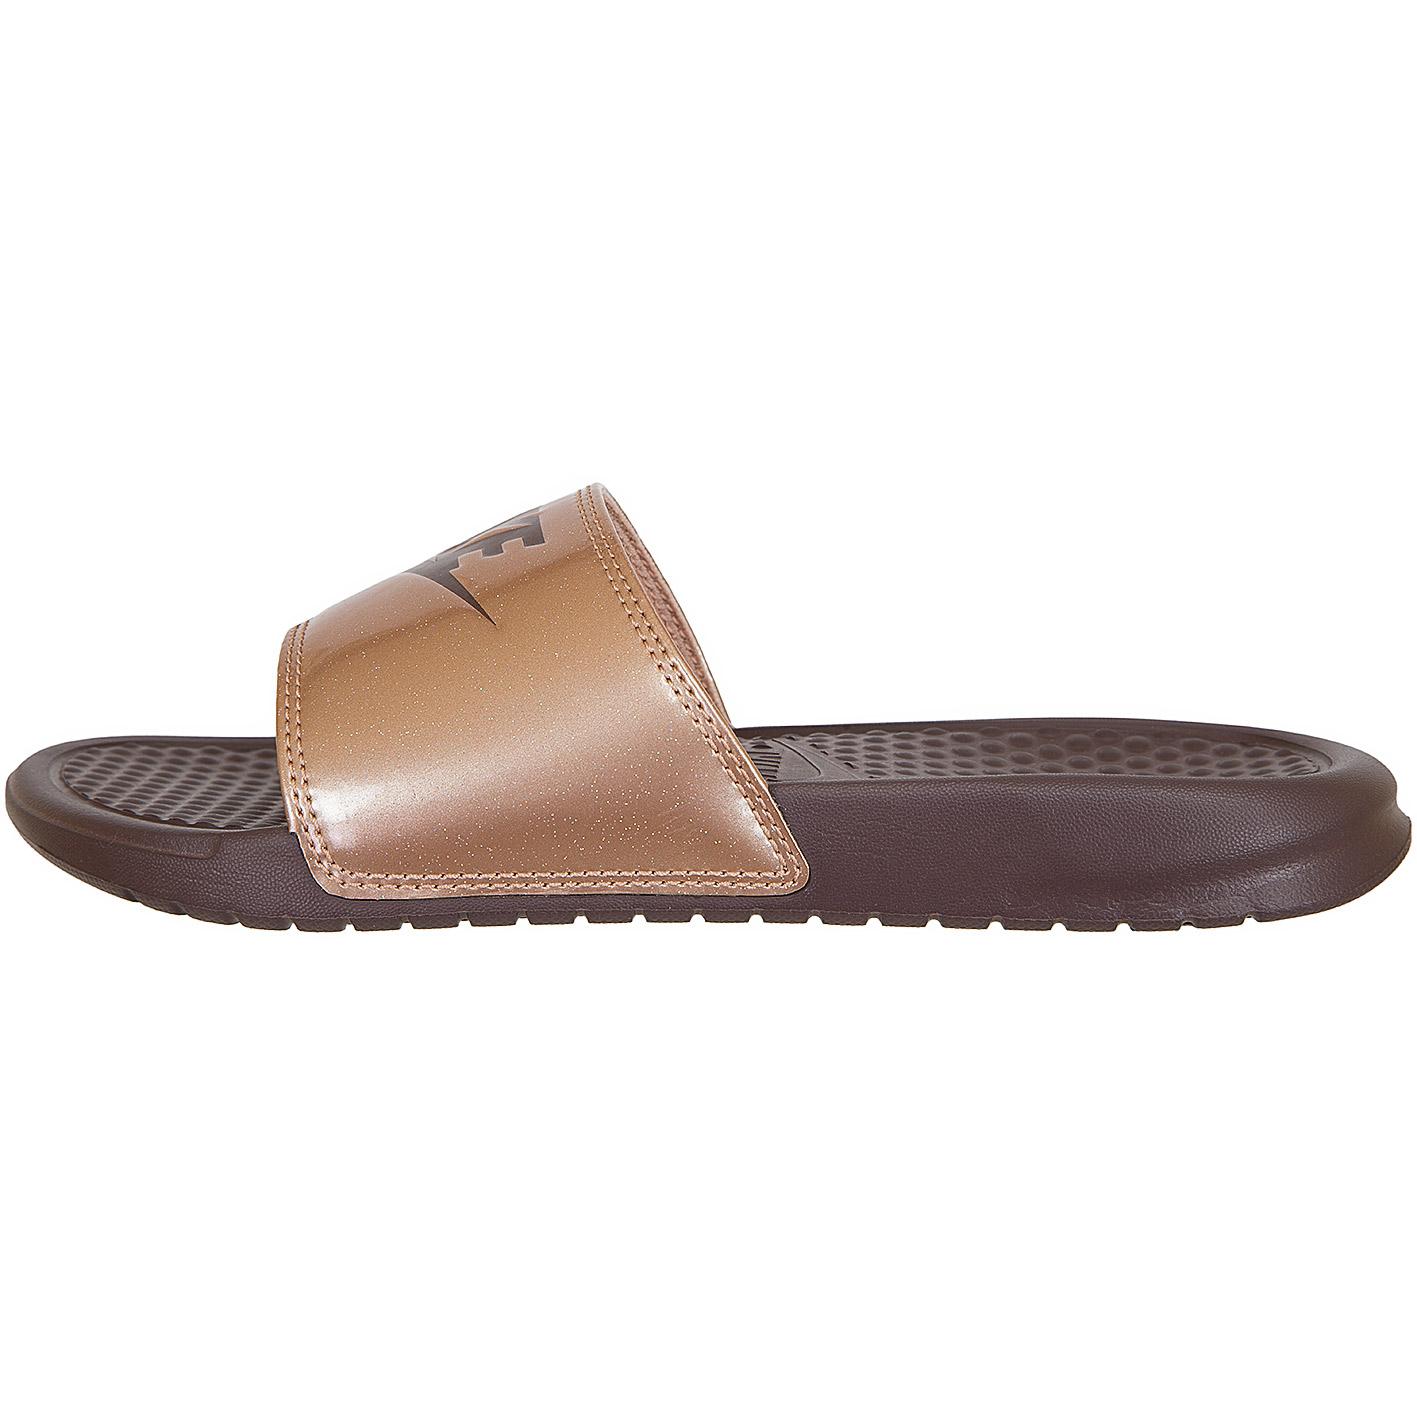 low priced 3484b 0bb98 Nike Damen Sandalen Benassi Just Do It rot-bronze